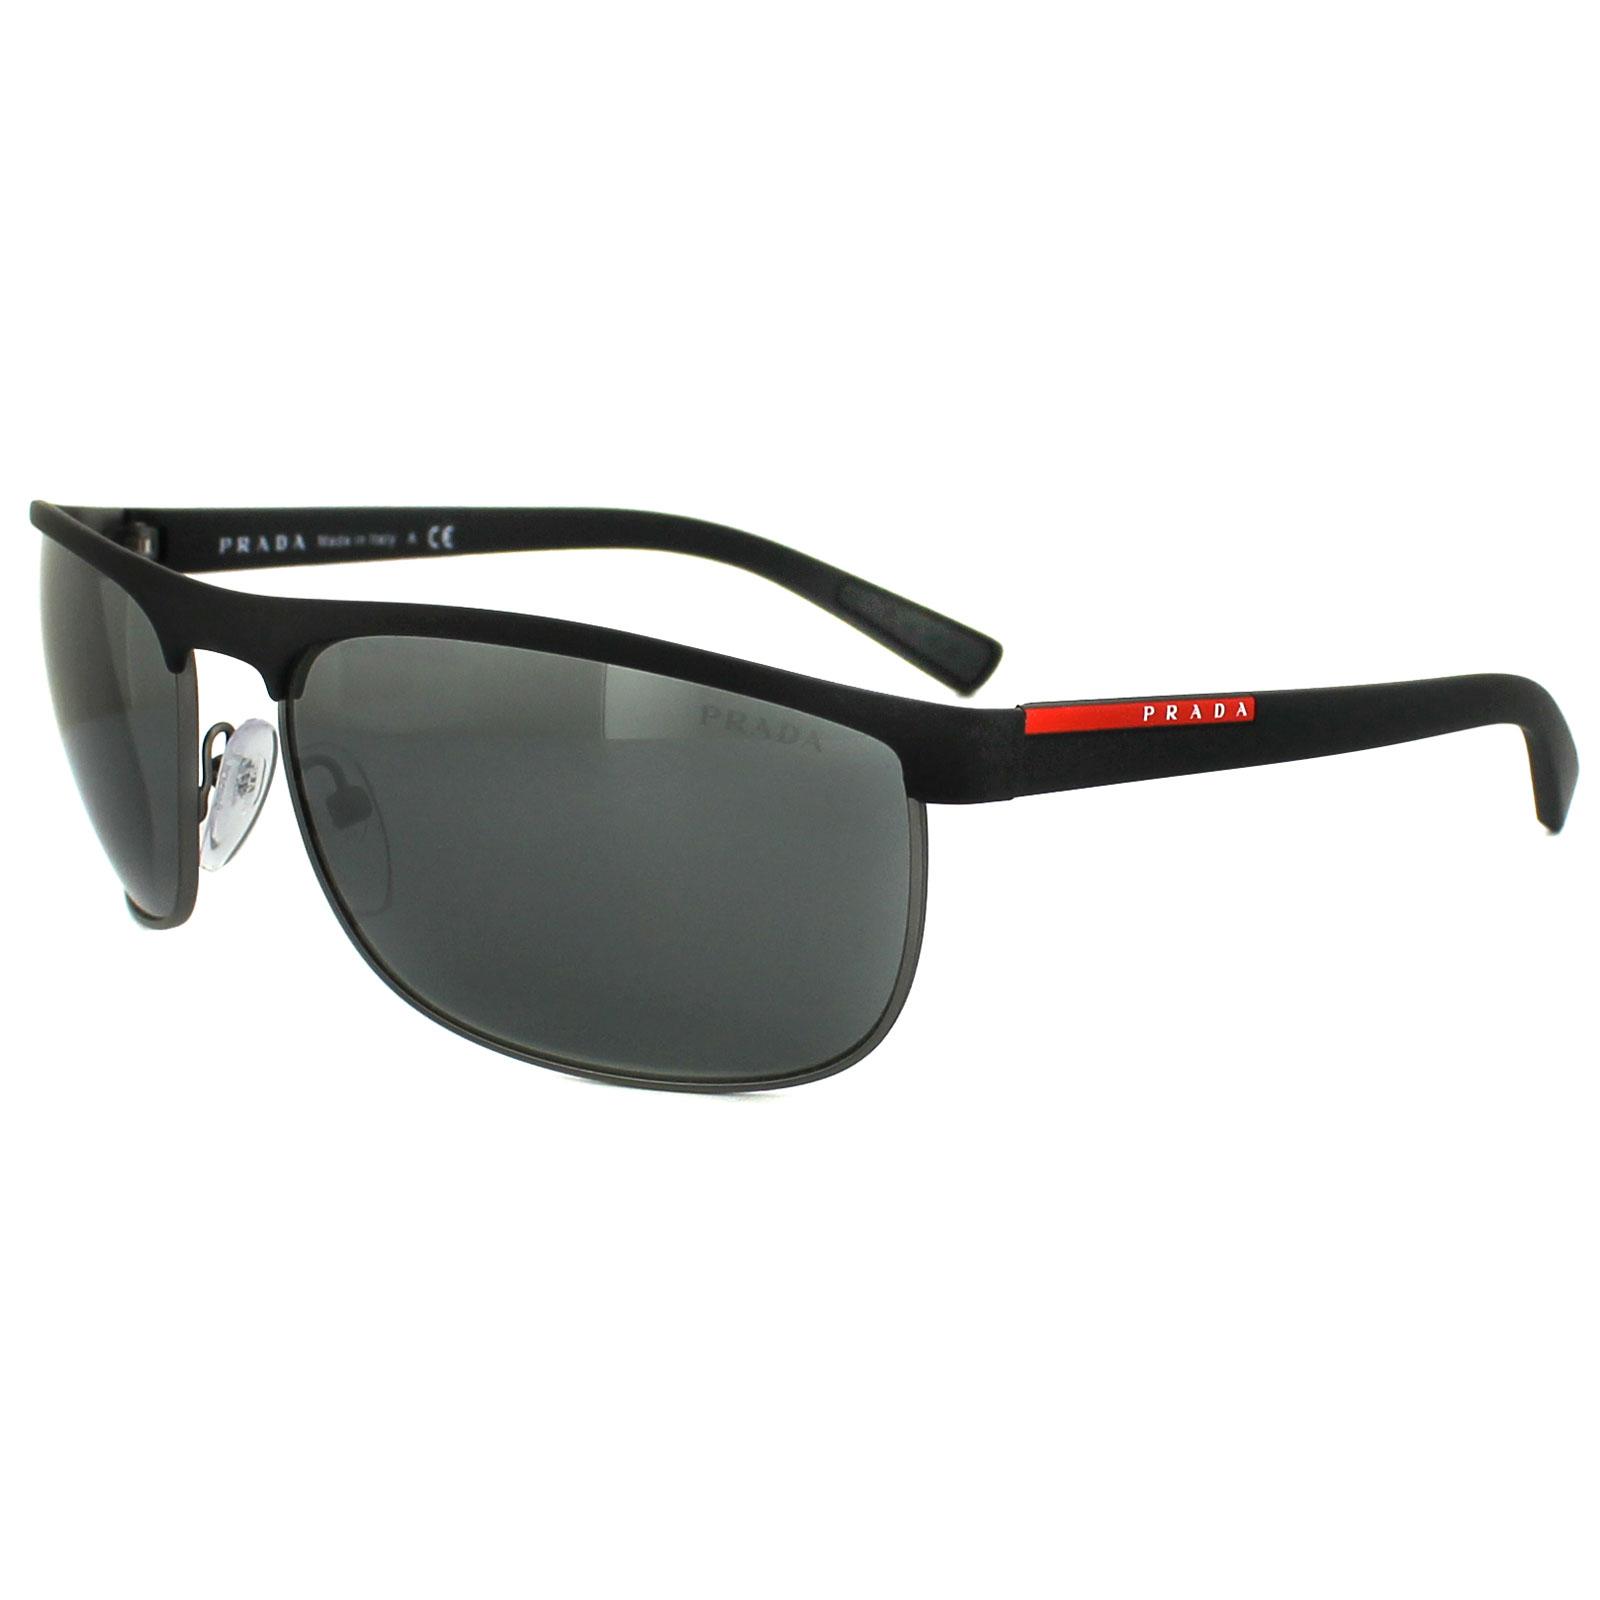 a9c9a37353d White Prada Sunglasses - Ontario Active School Travel